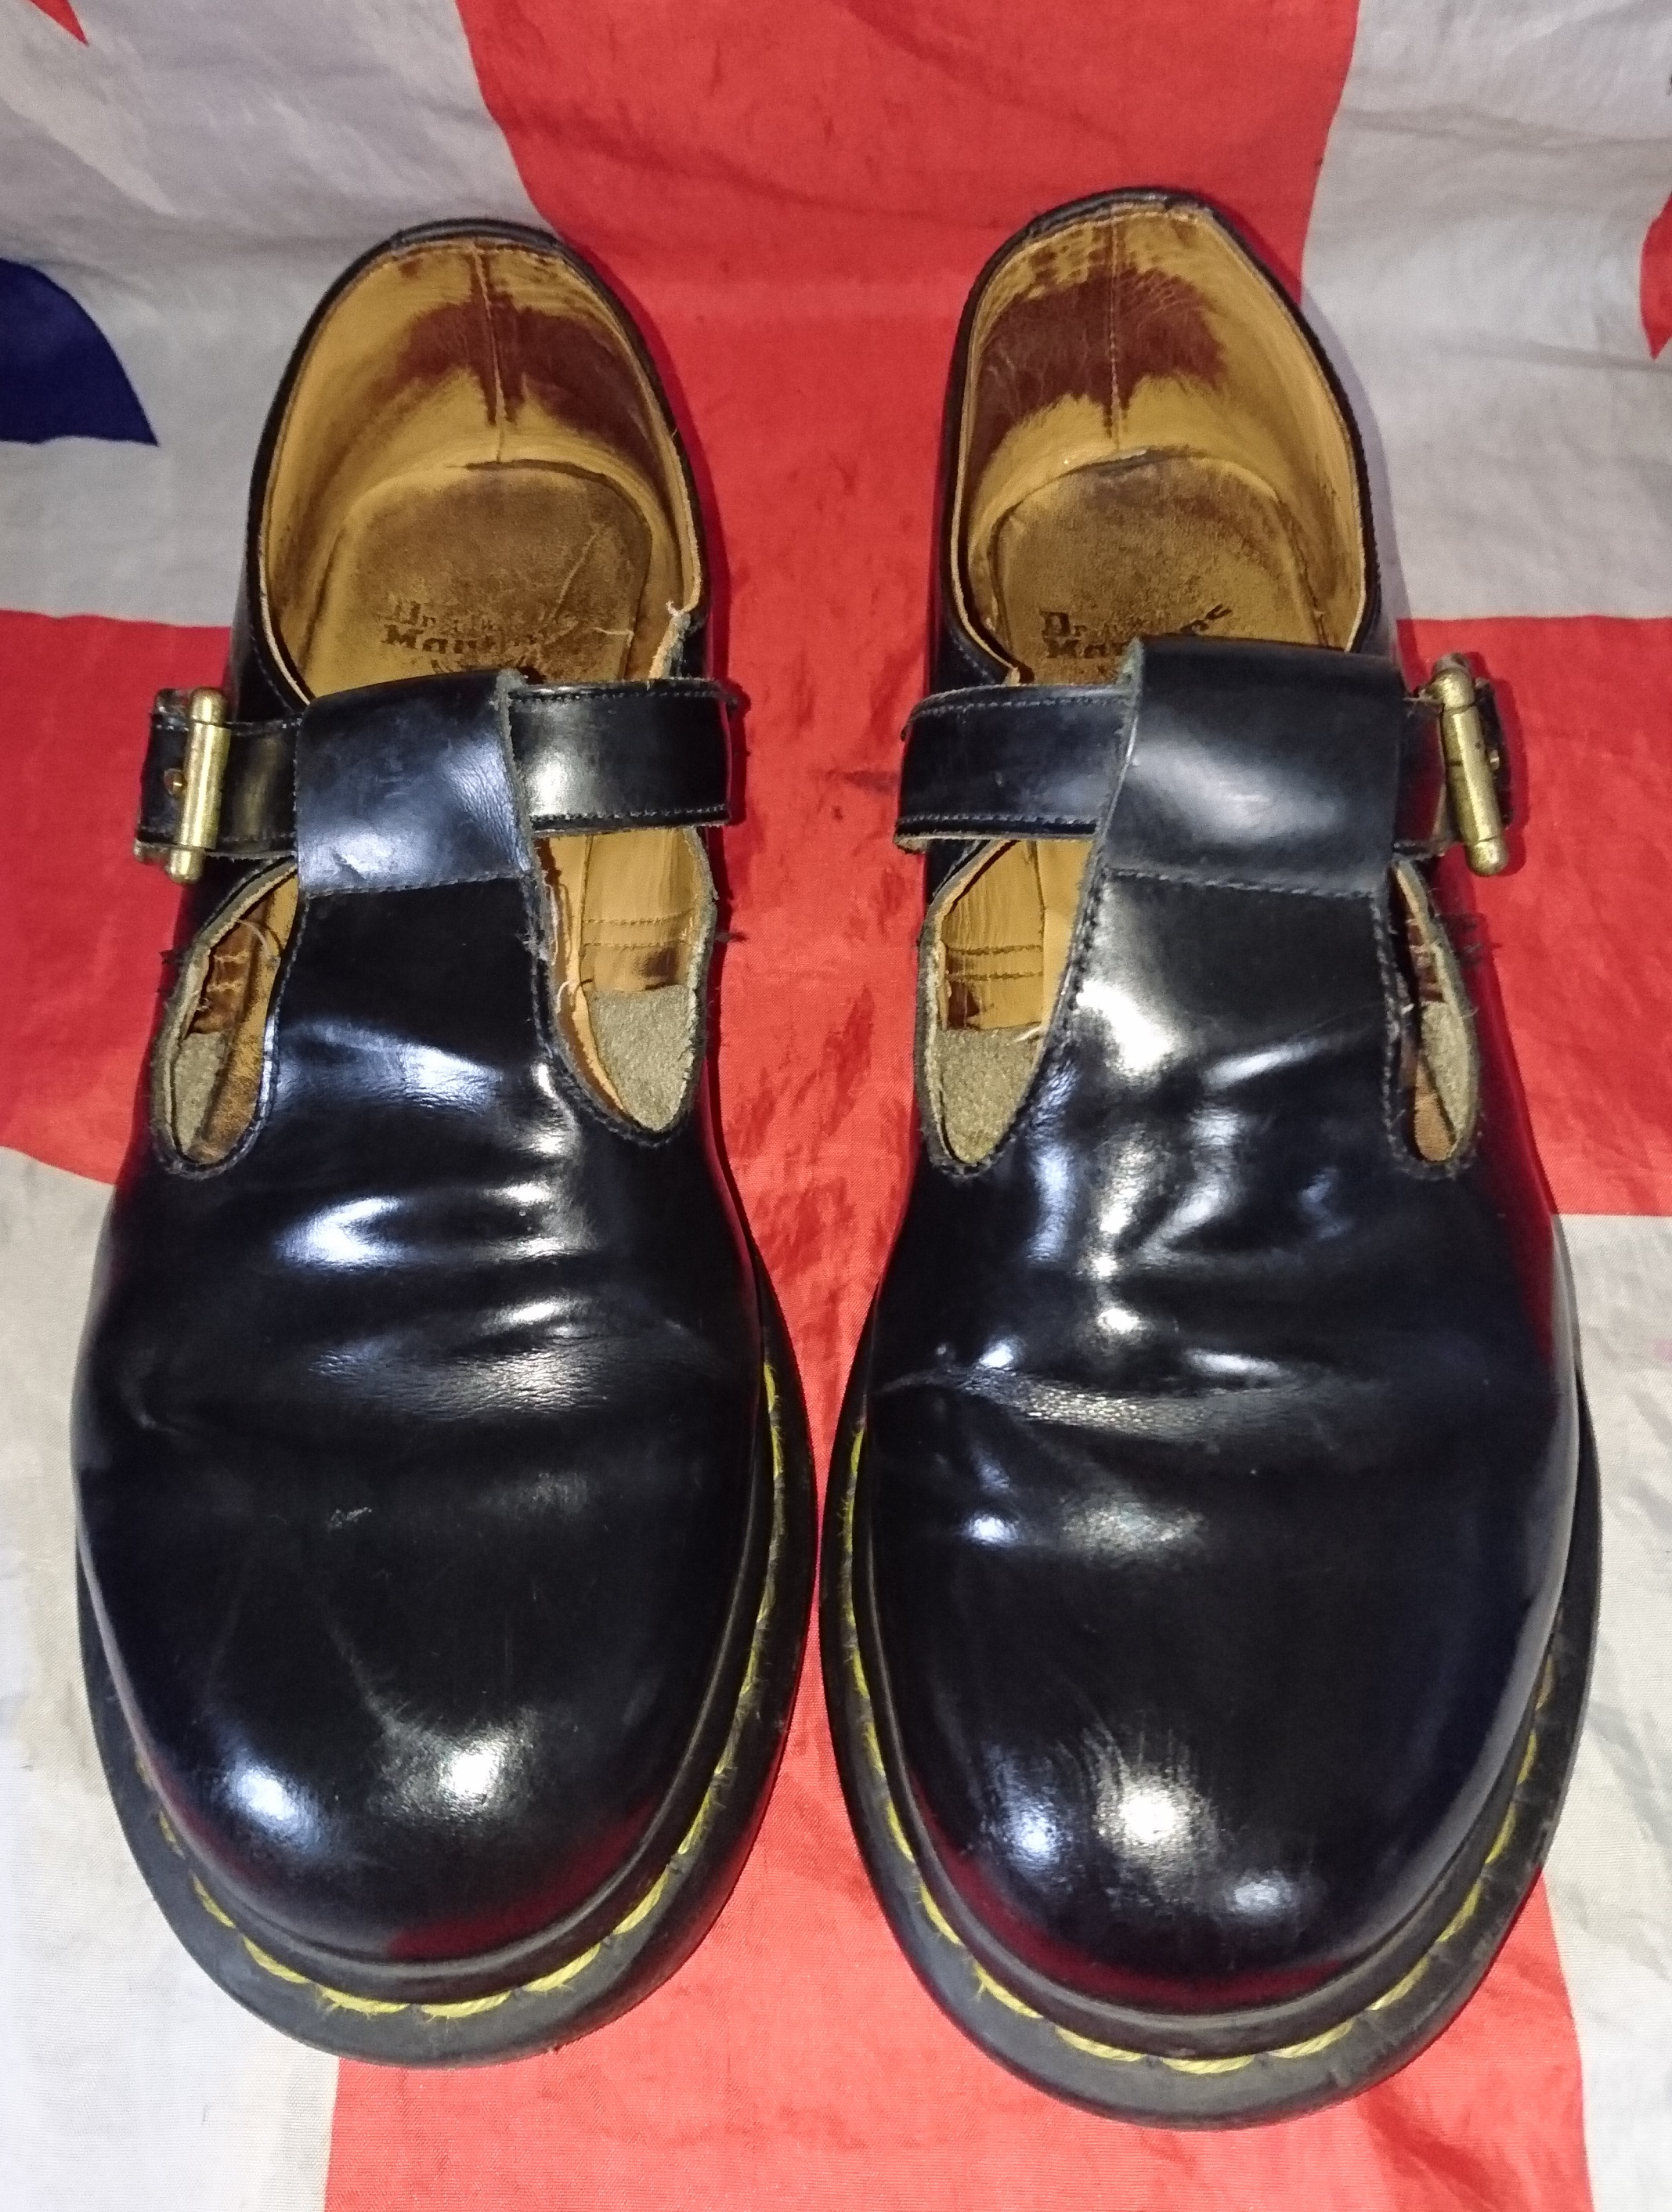 a4de5db0e47 Polley - Black T Bar Dr Doc Martens Mary Jane Shoes - UK 7*EU 41*USL 9 from  Digital Docs